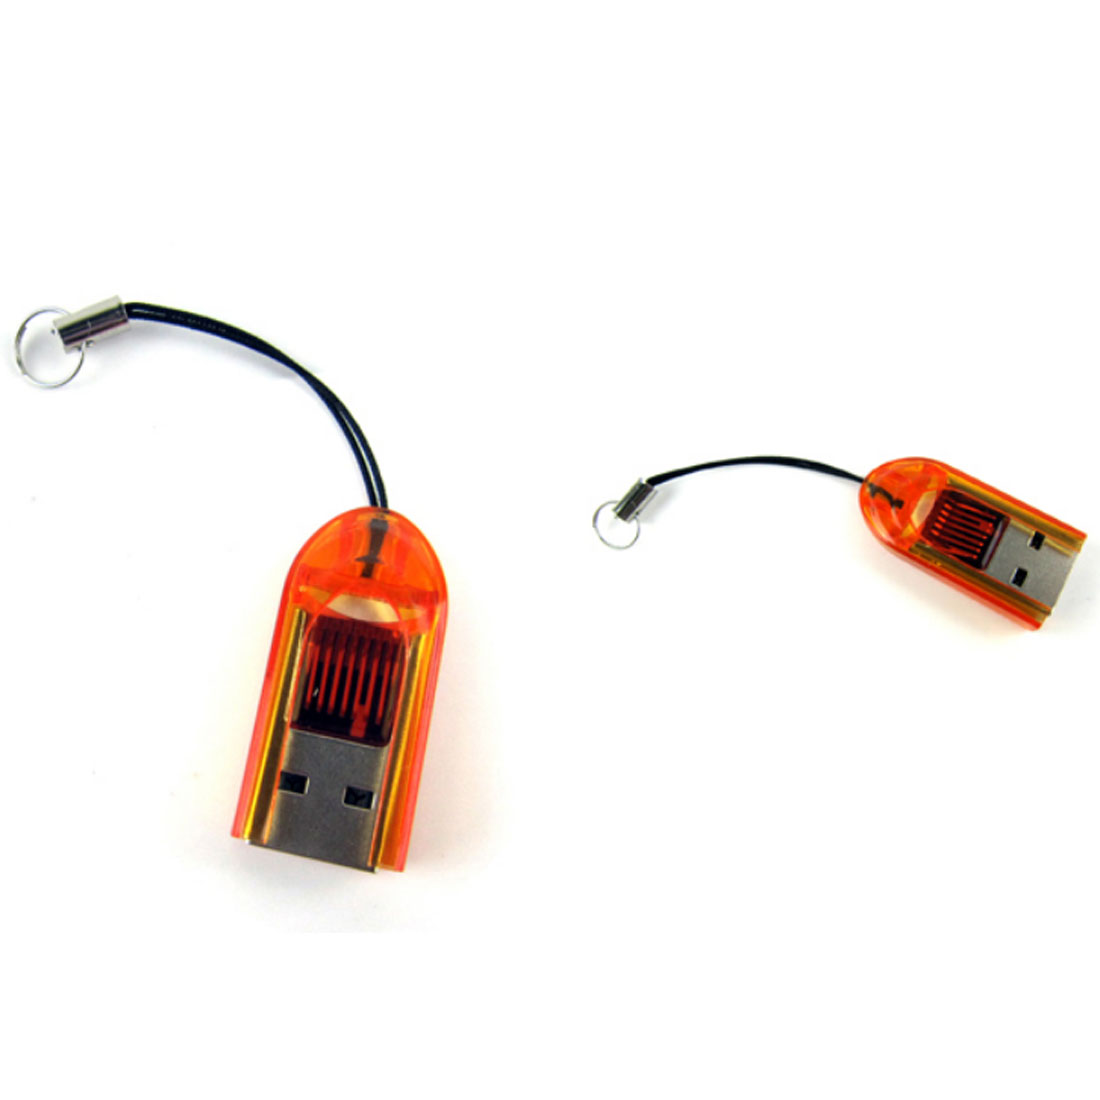 NOYOKERE 10pcs/lot Mini USB 2.0 Micro SD MicroSD TF Flash Memory Card Reader for iPhone Mobile phones Multicolors